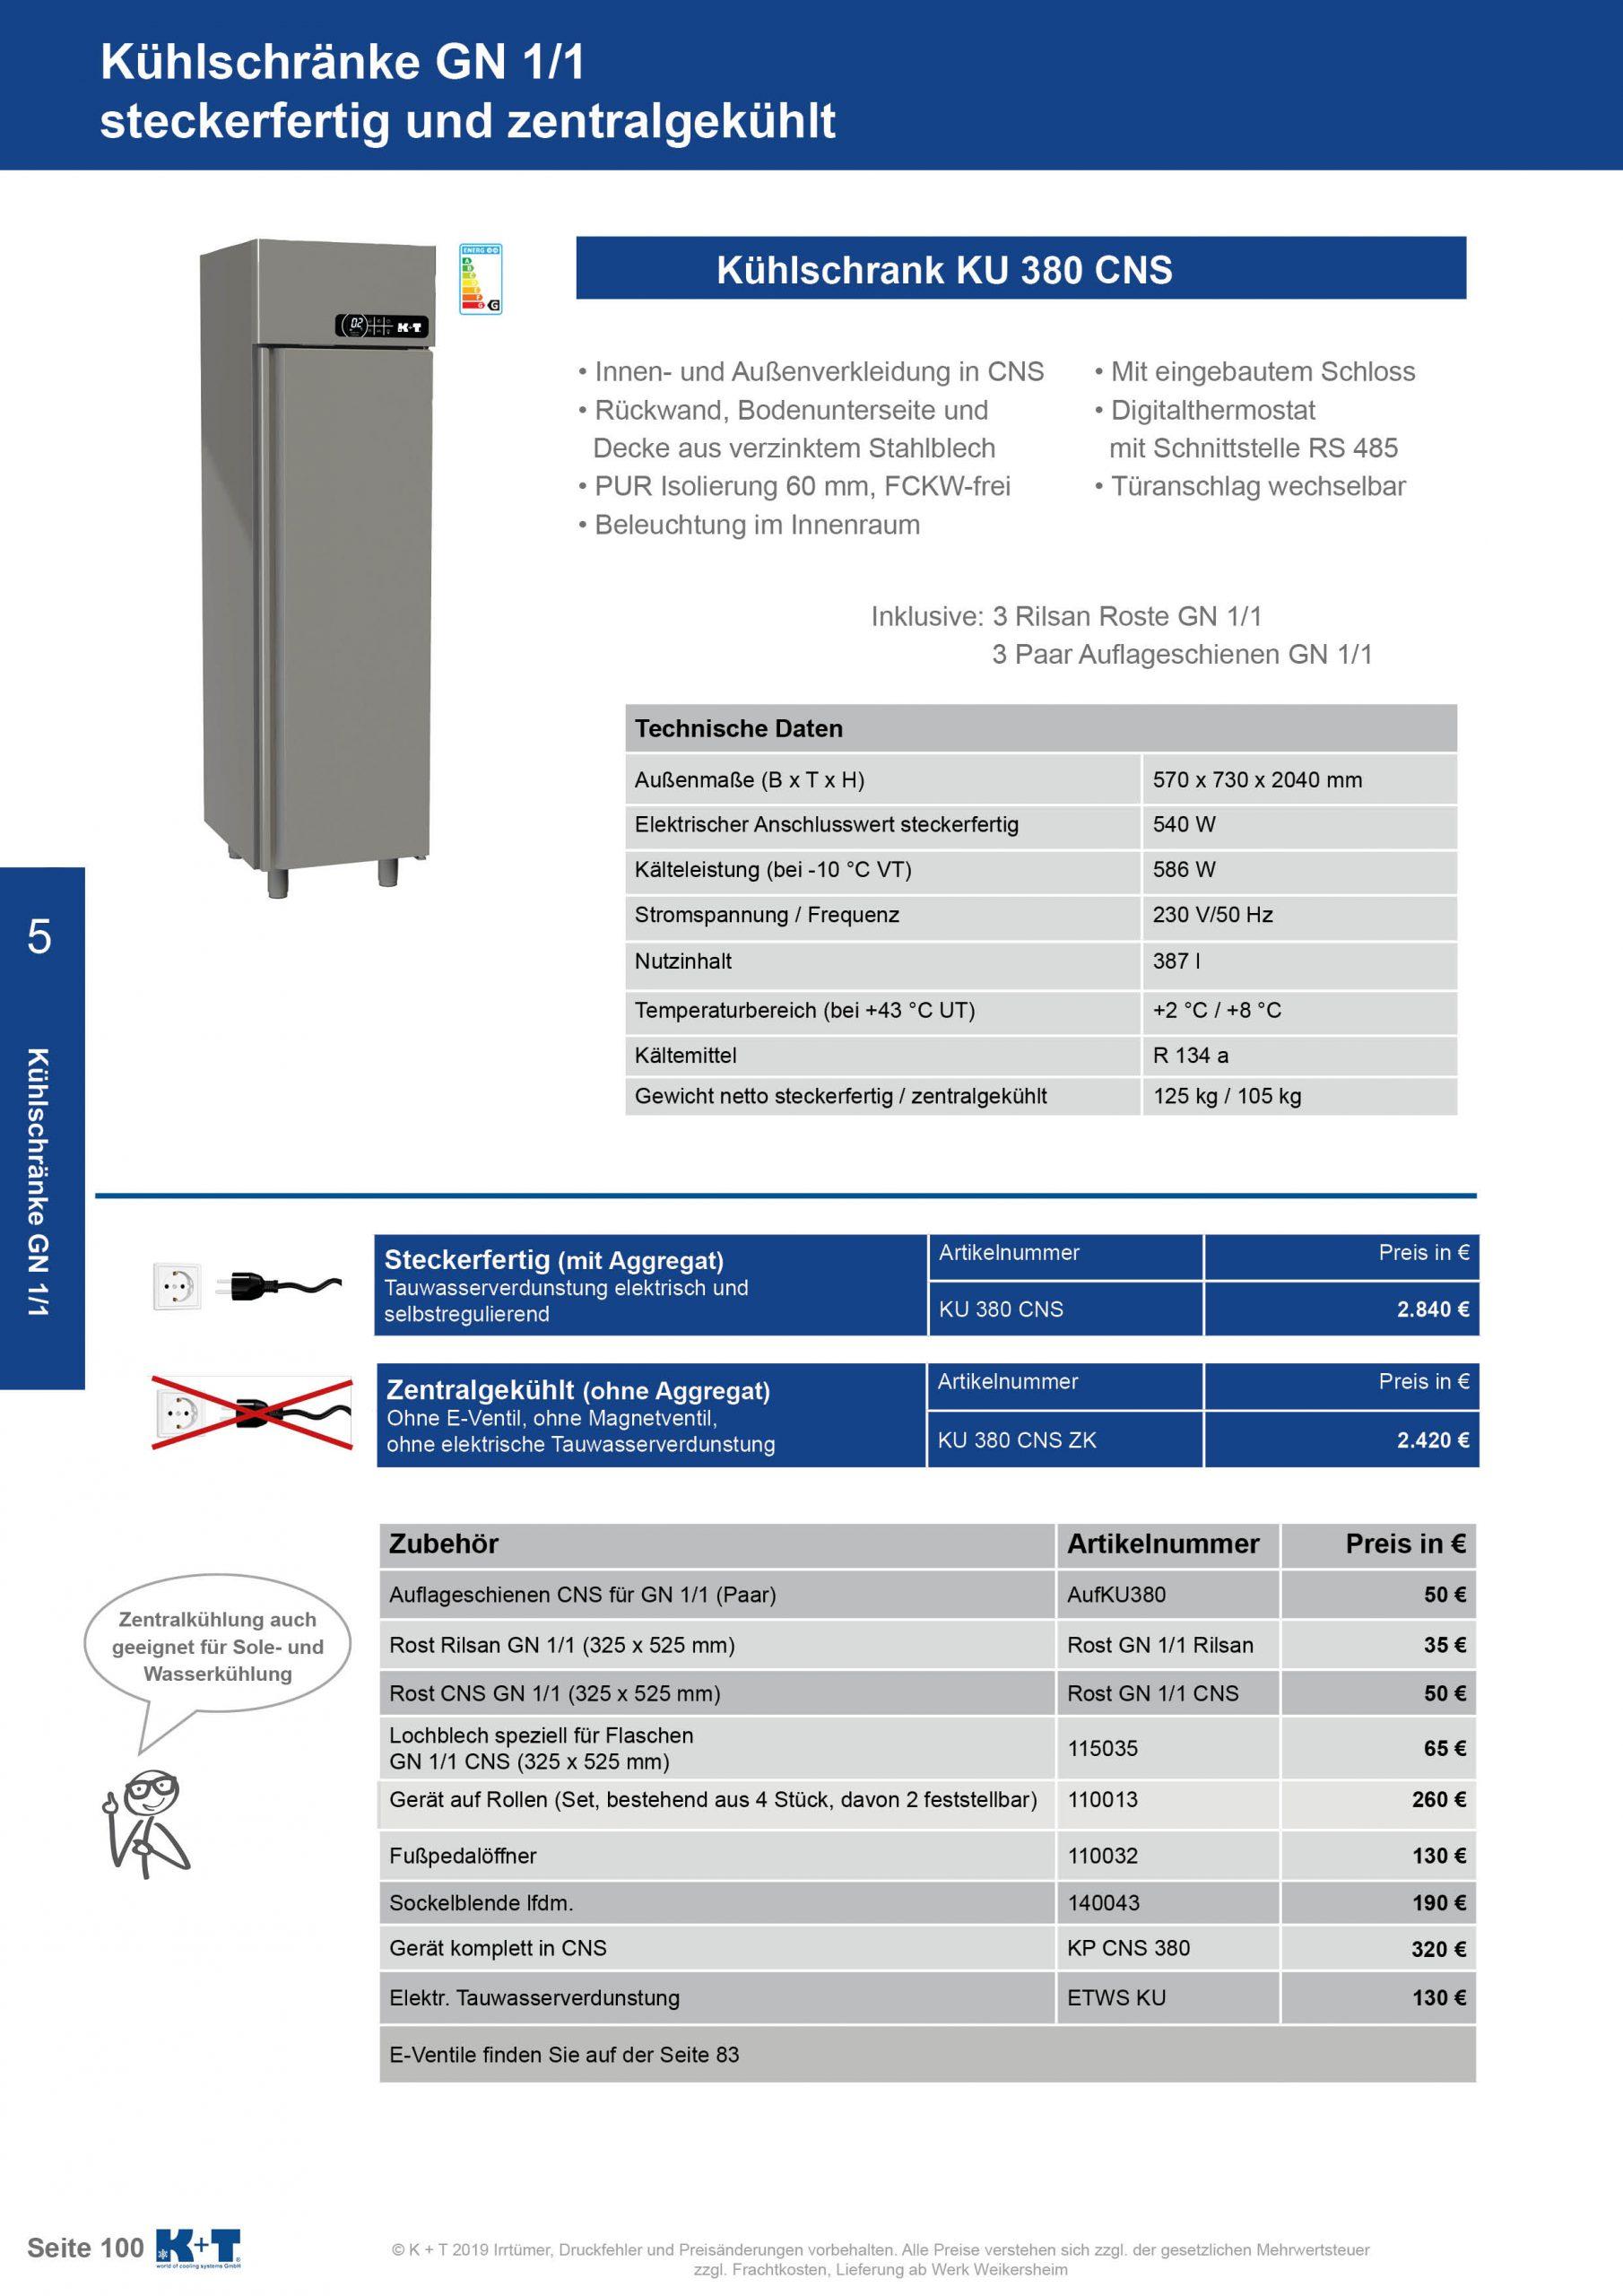 Kühlschränke GN 1_1 Kühlschrank steckerfertig